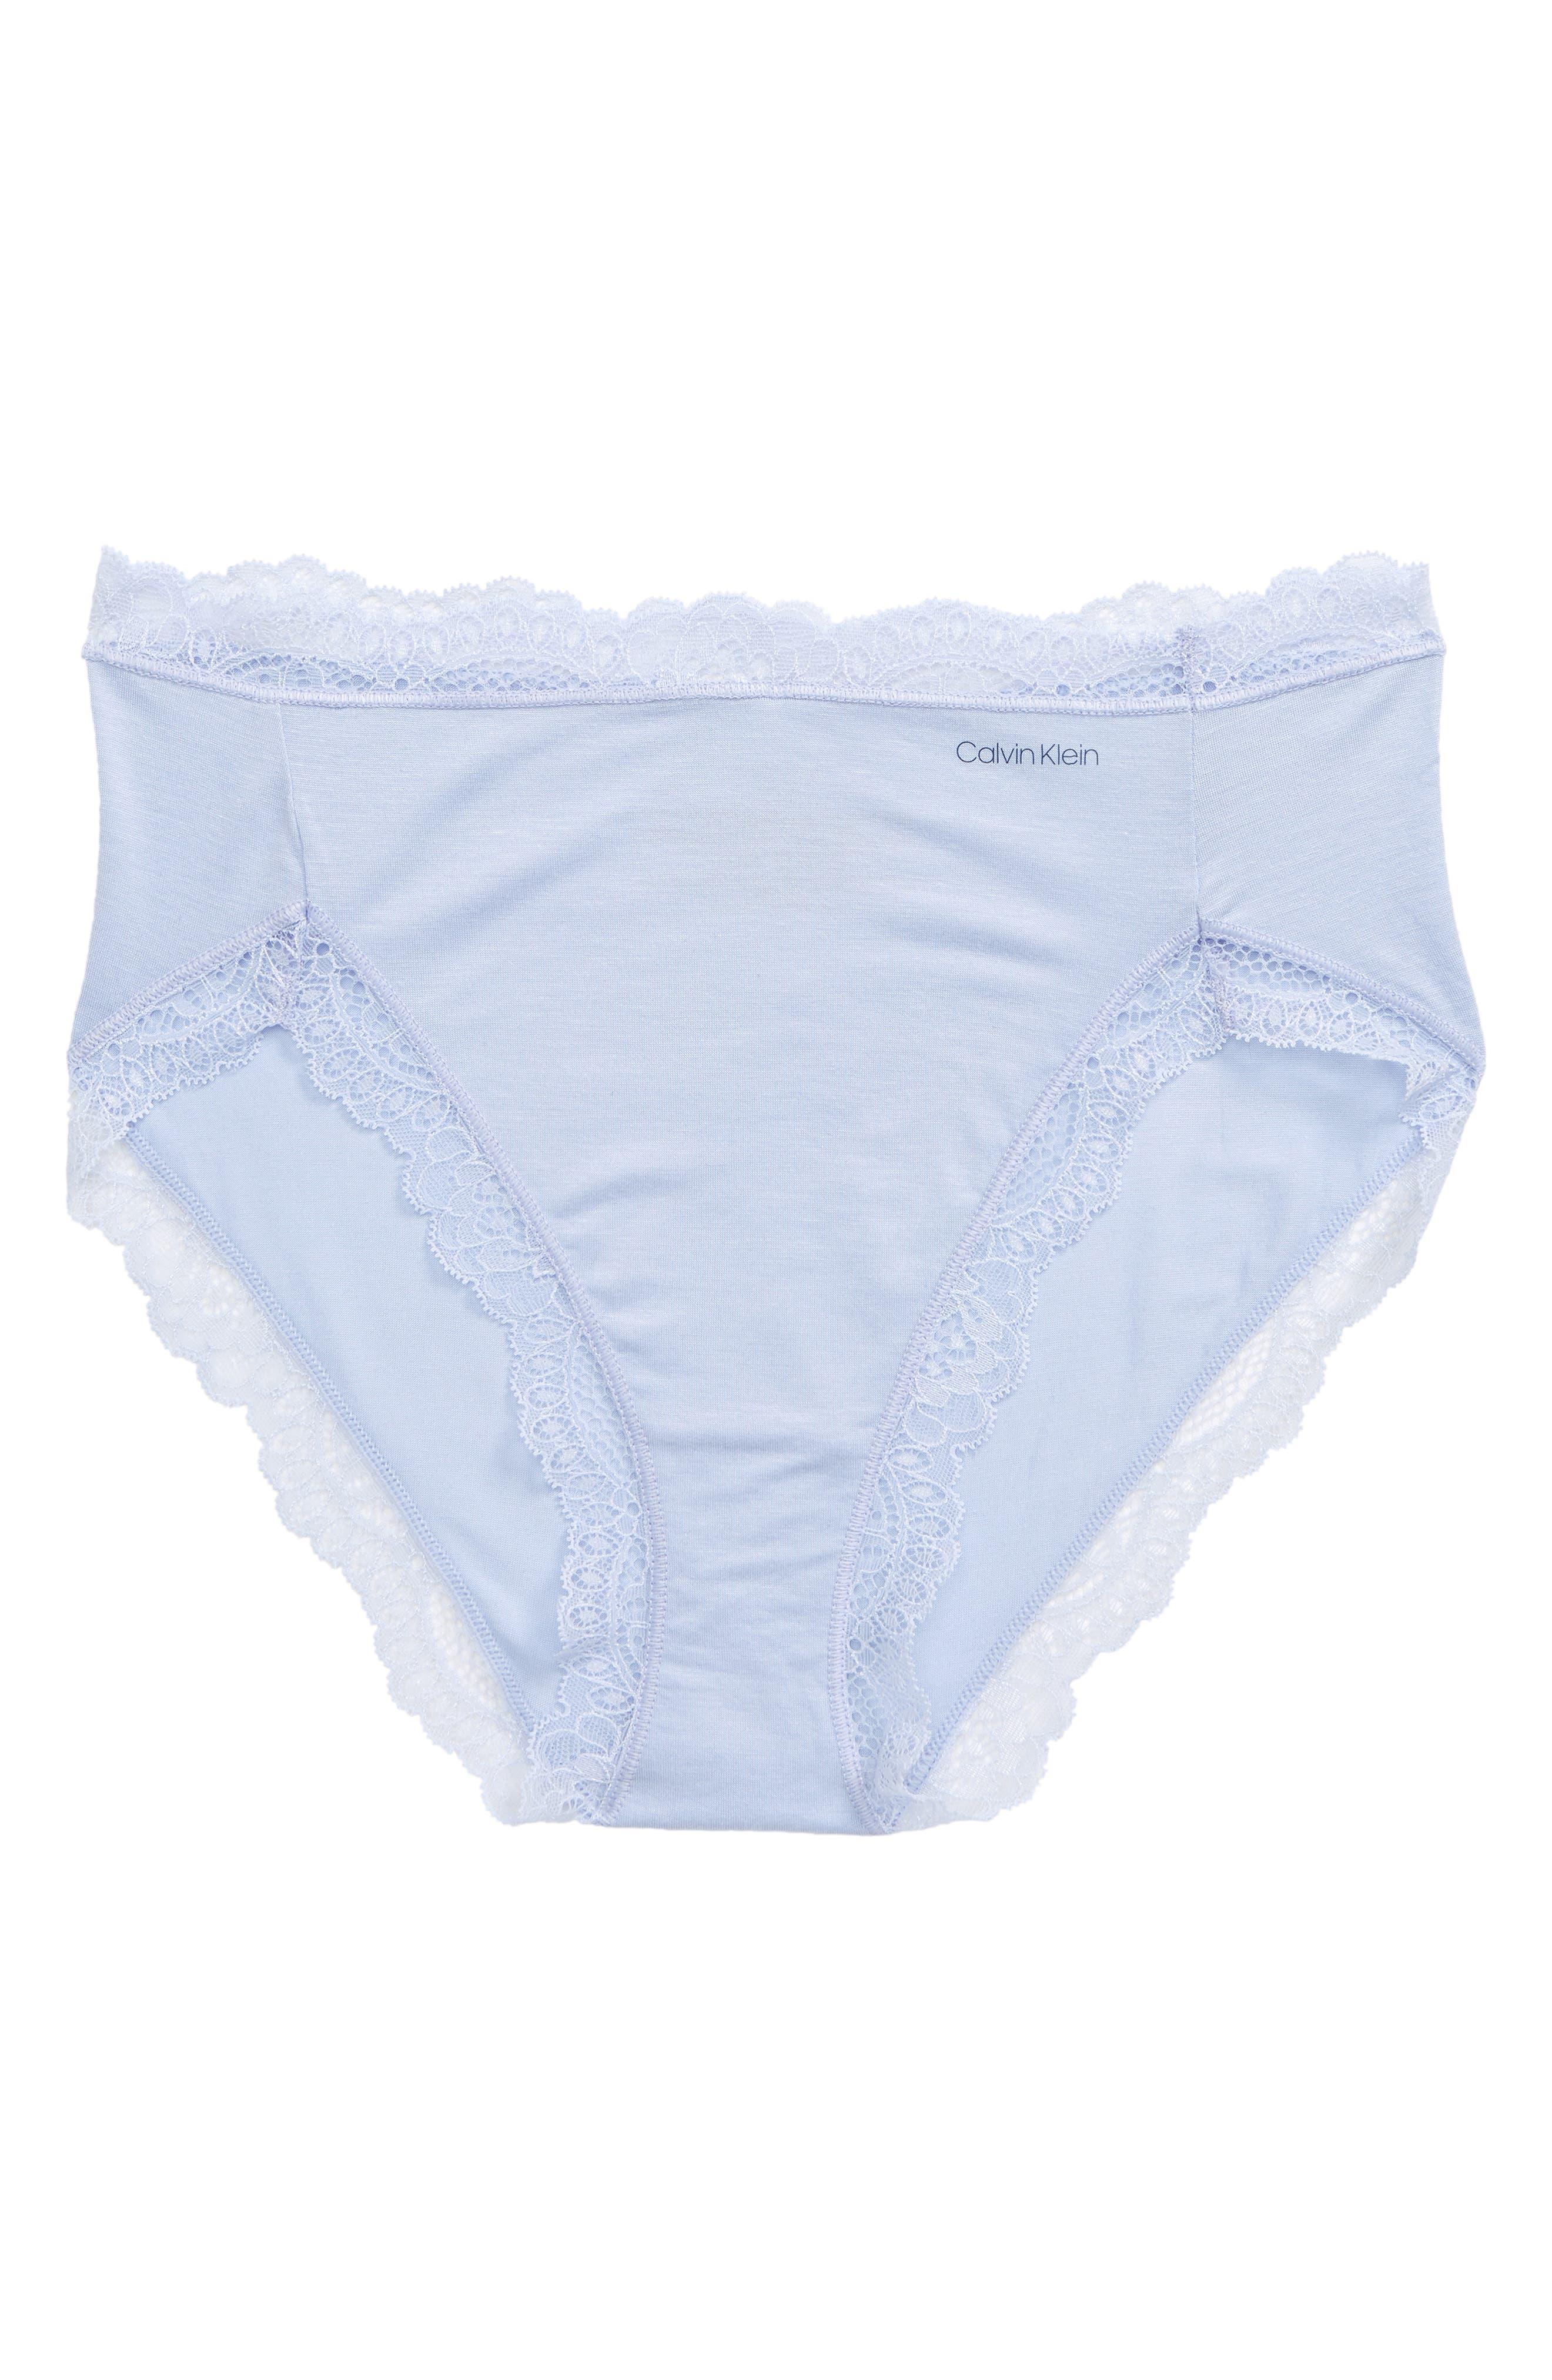 Panty Hipster Cotton Treasure Hunt navywhite